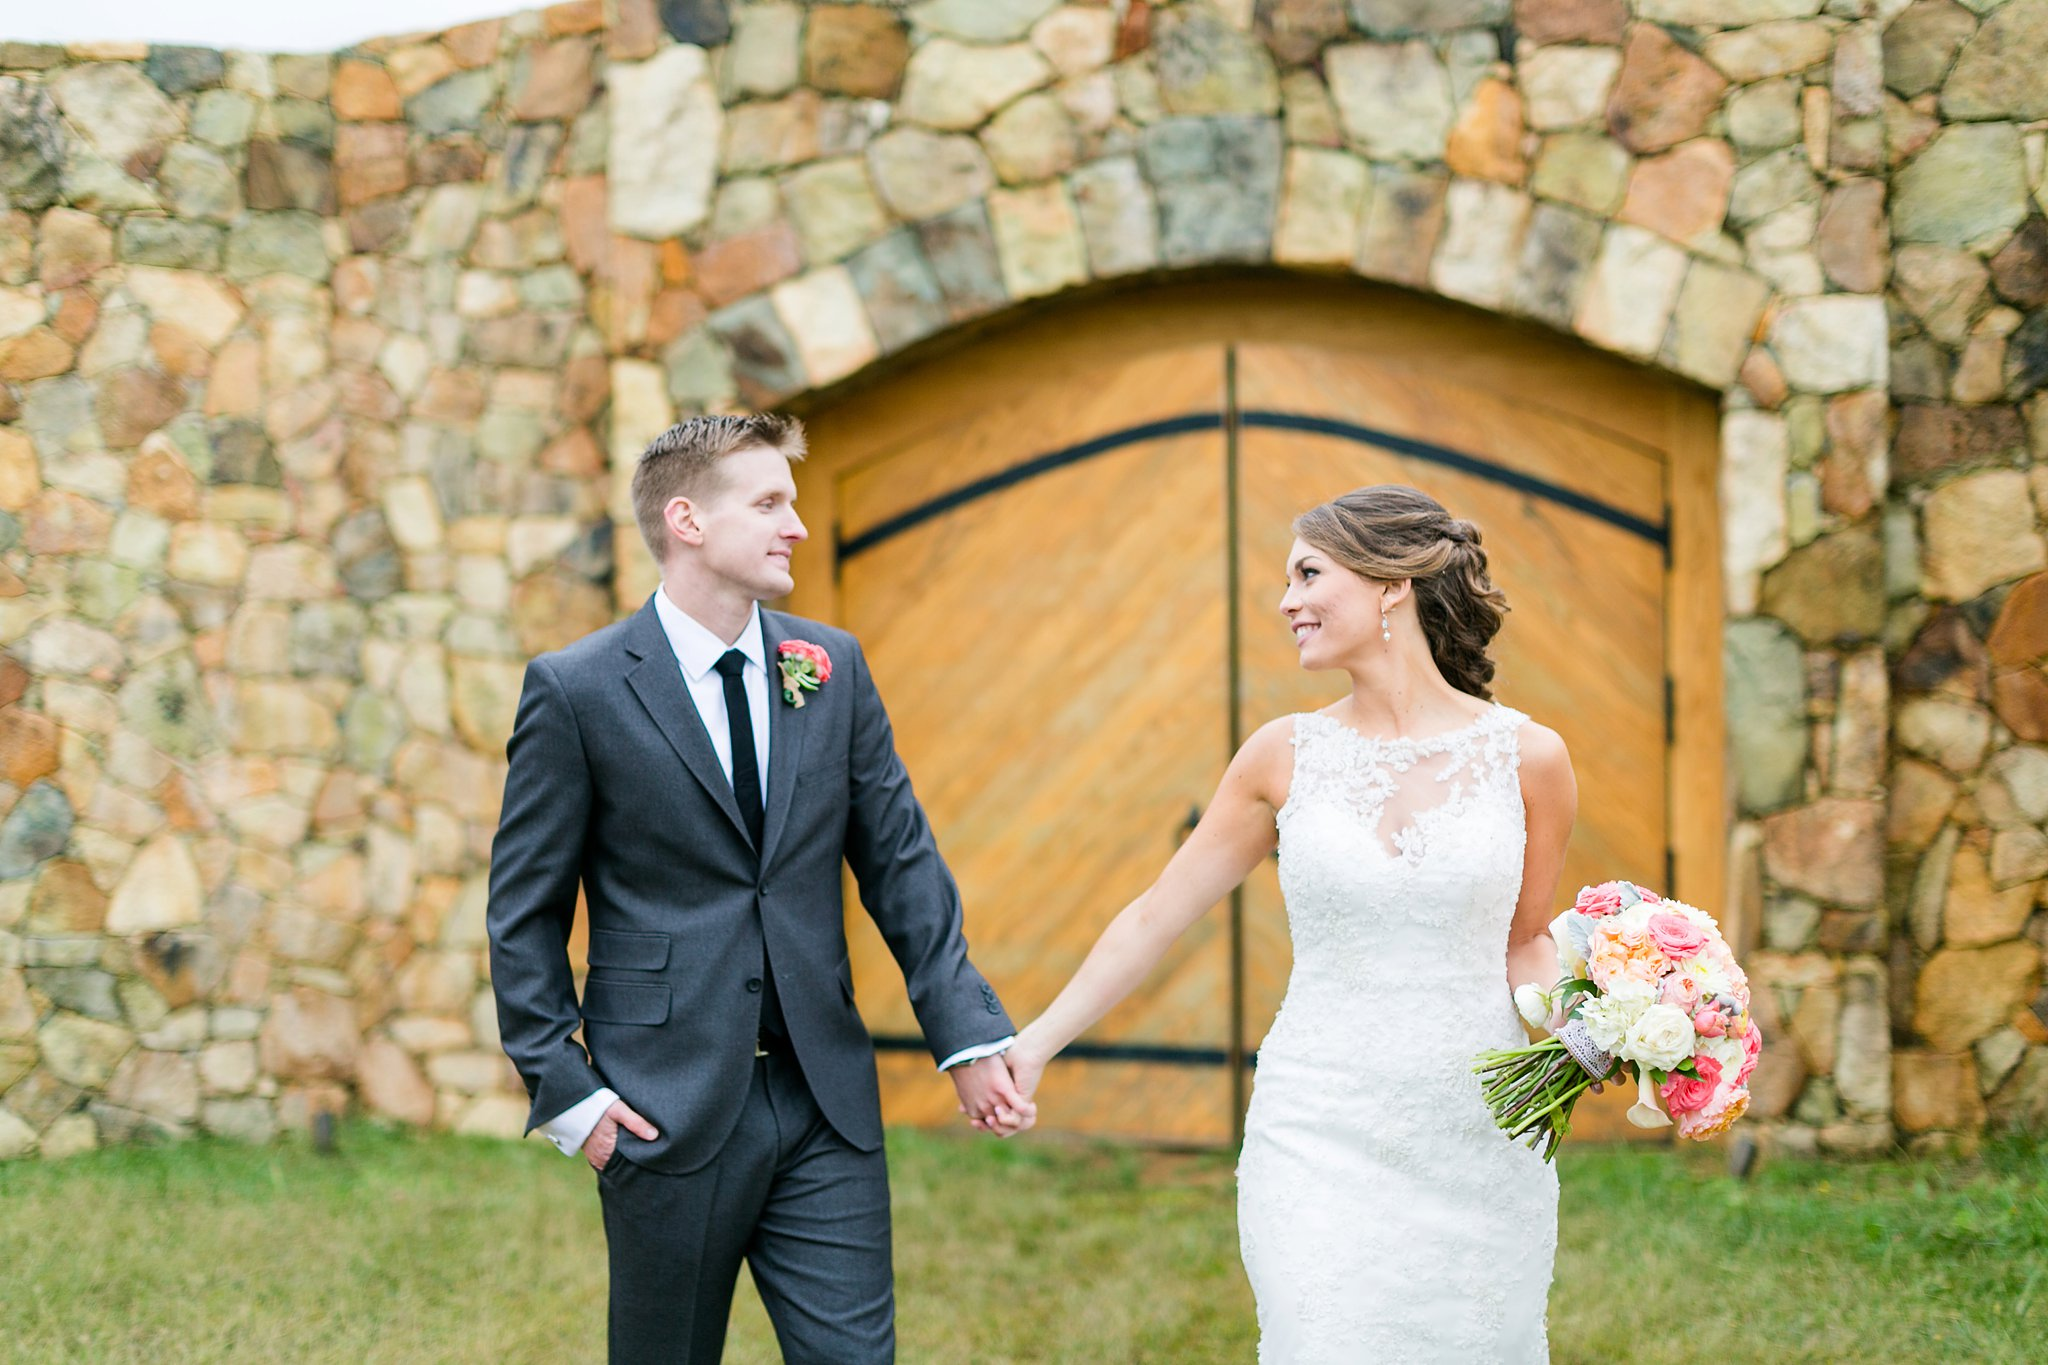 Stone Tower Winery Wedding Photos Virginia Wedding Photographer Megan Kelsey Photography Sam & Angela-254.jpg